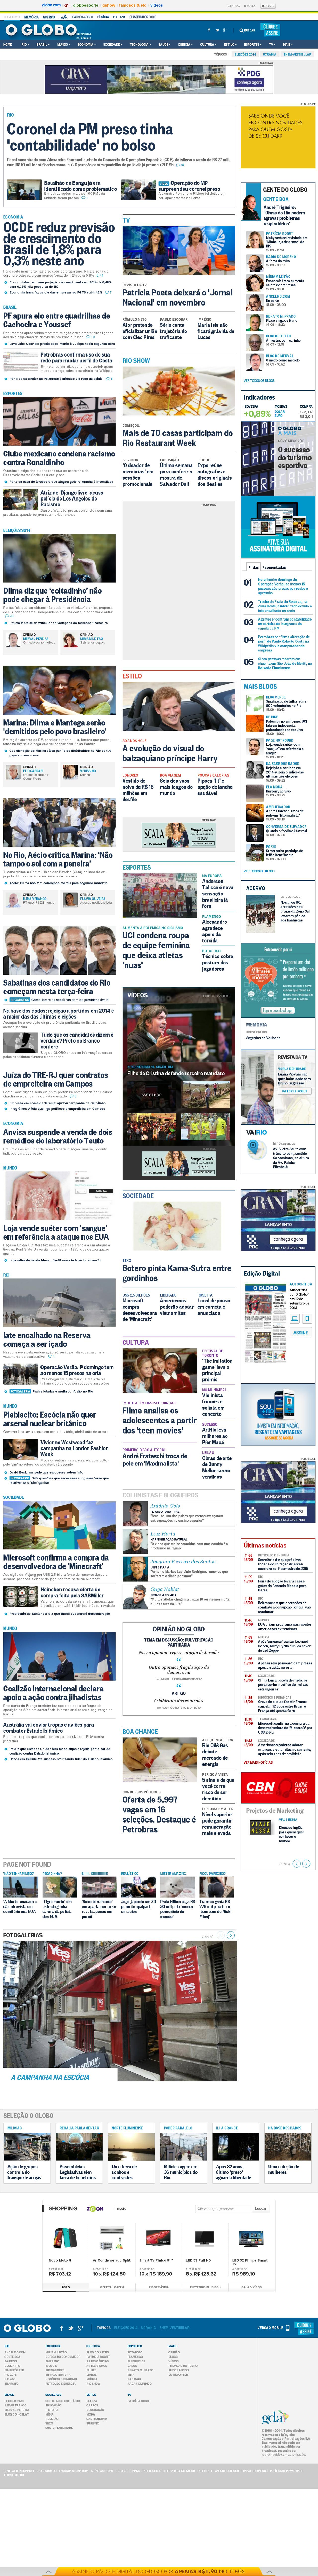 O Globo at Monday Sept. 15, 2014, 3:07 p.m. UTC